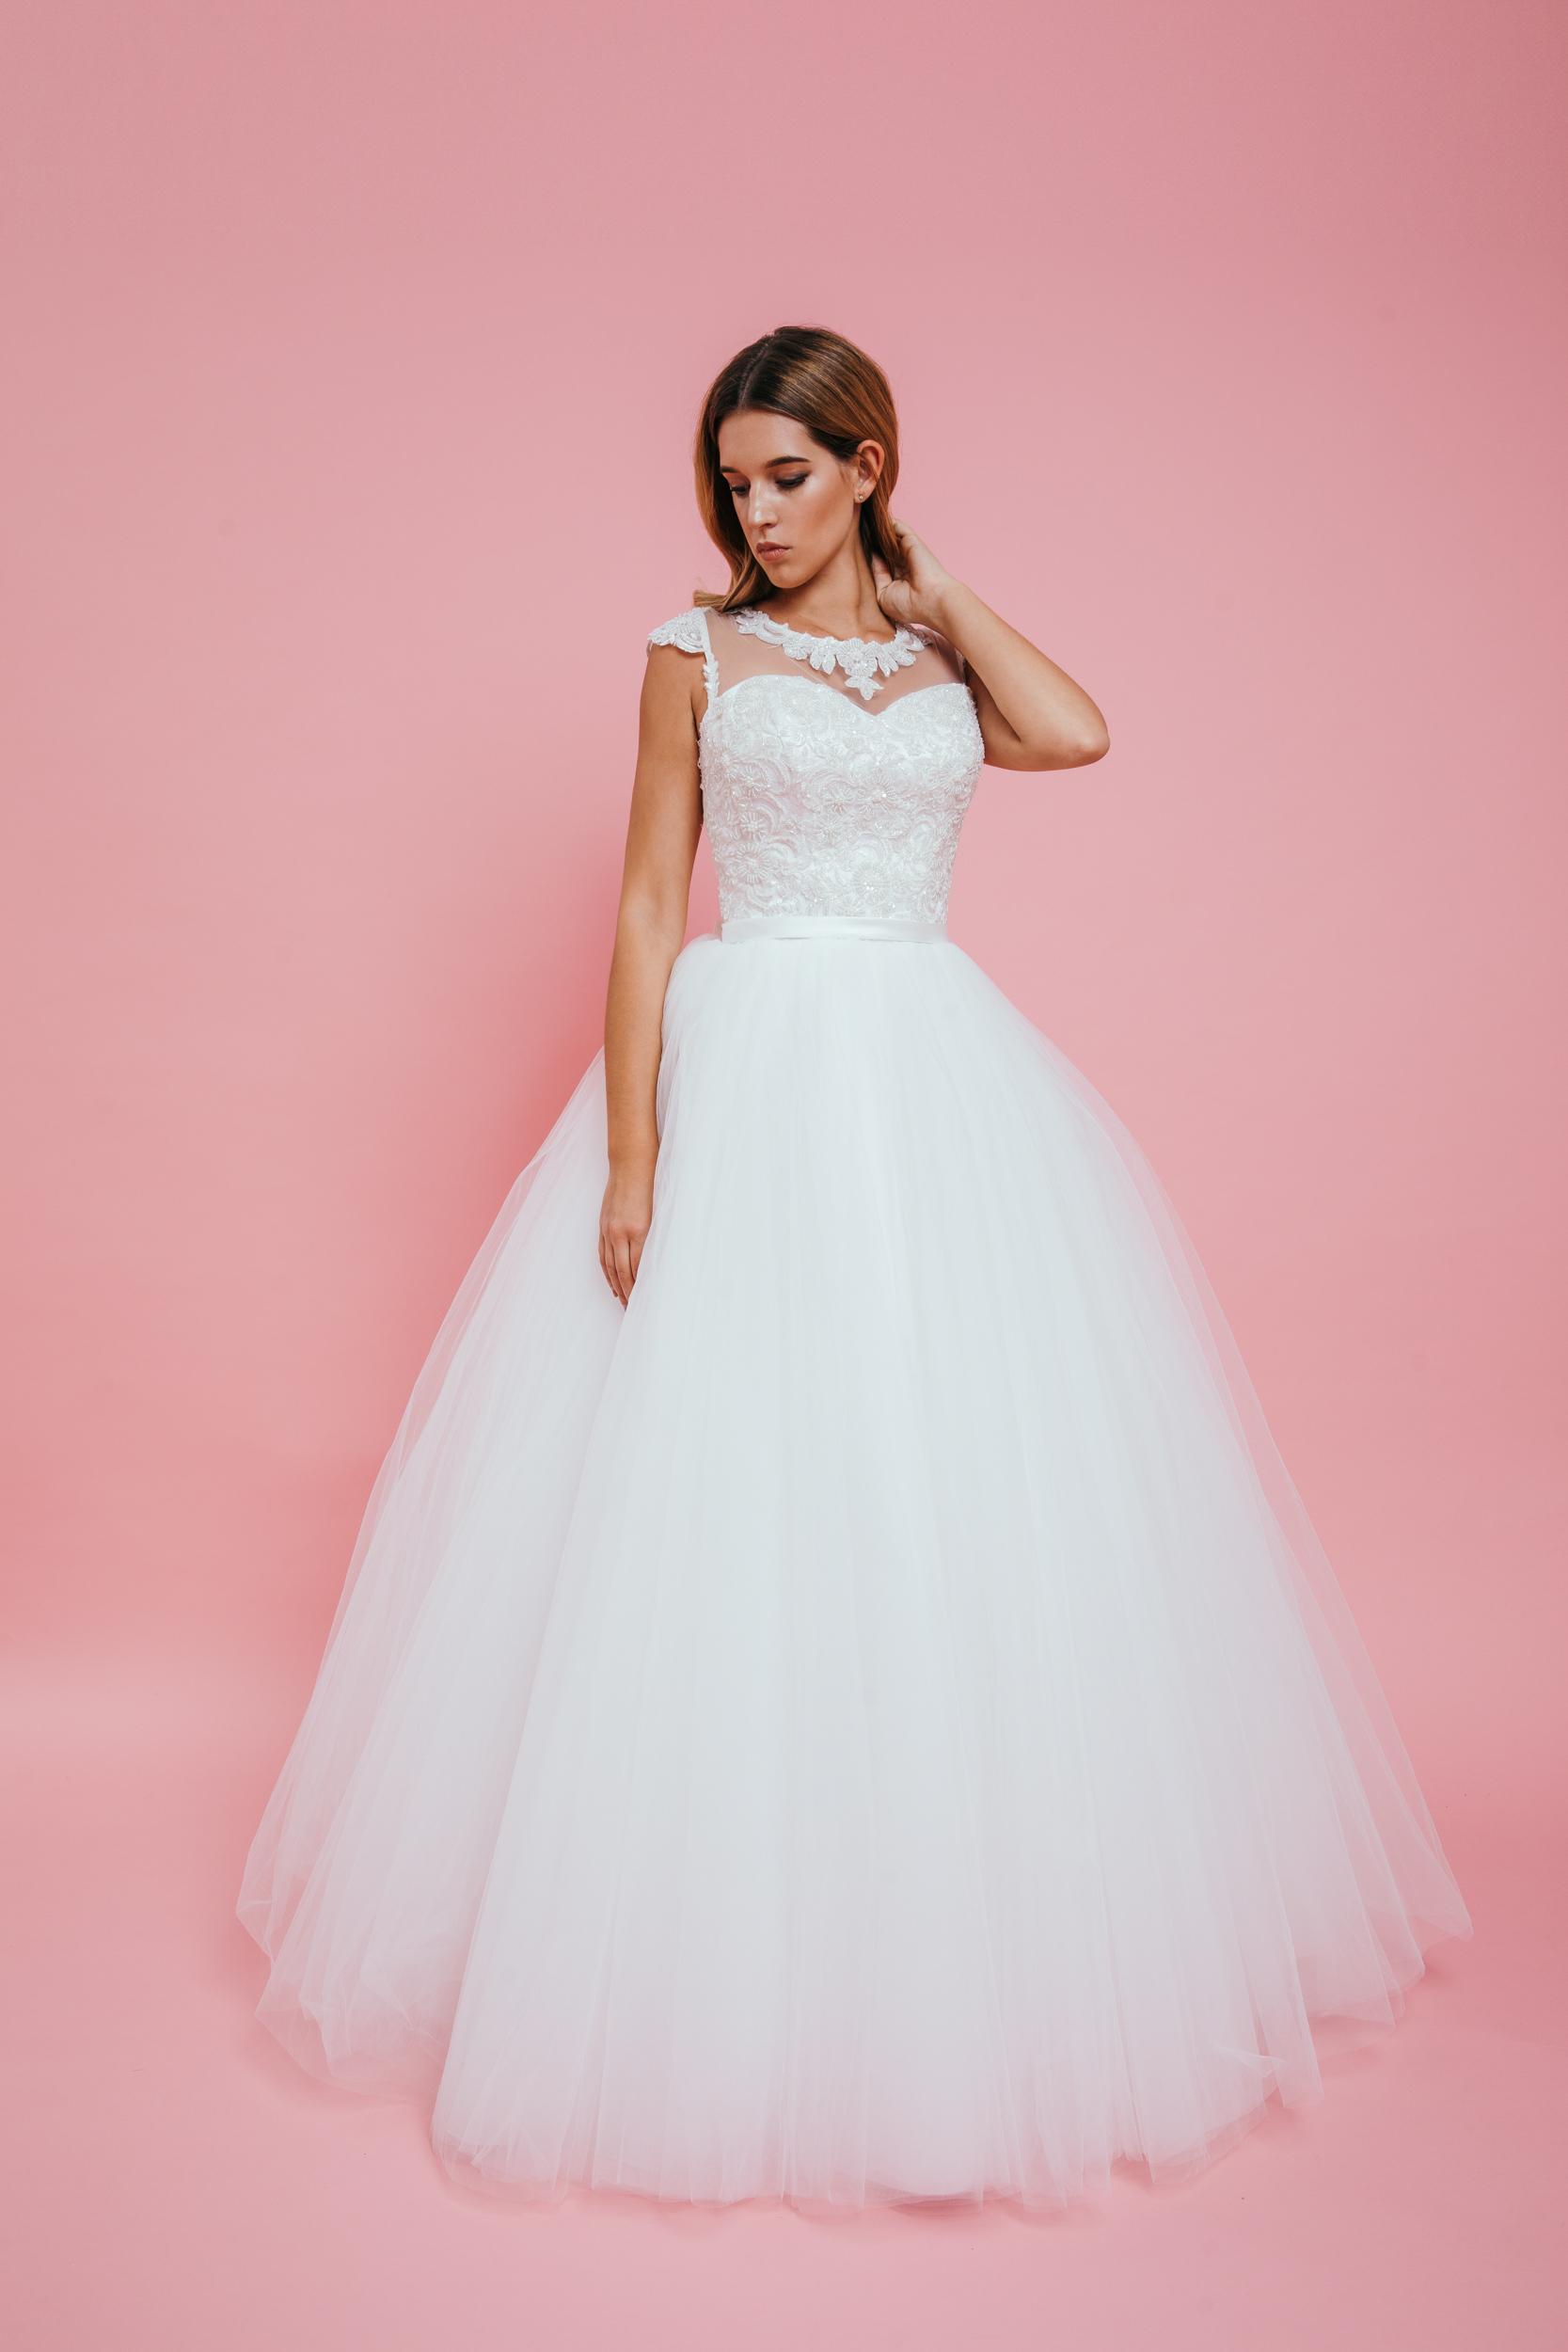 AMELIE – Menyasszonyi Ruha e55376ee99